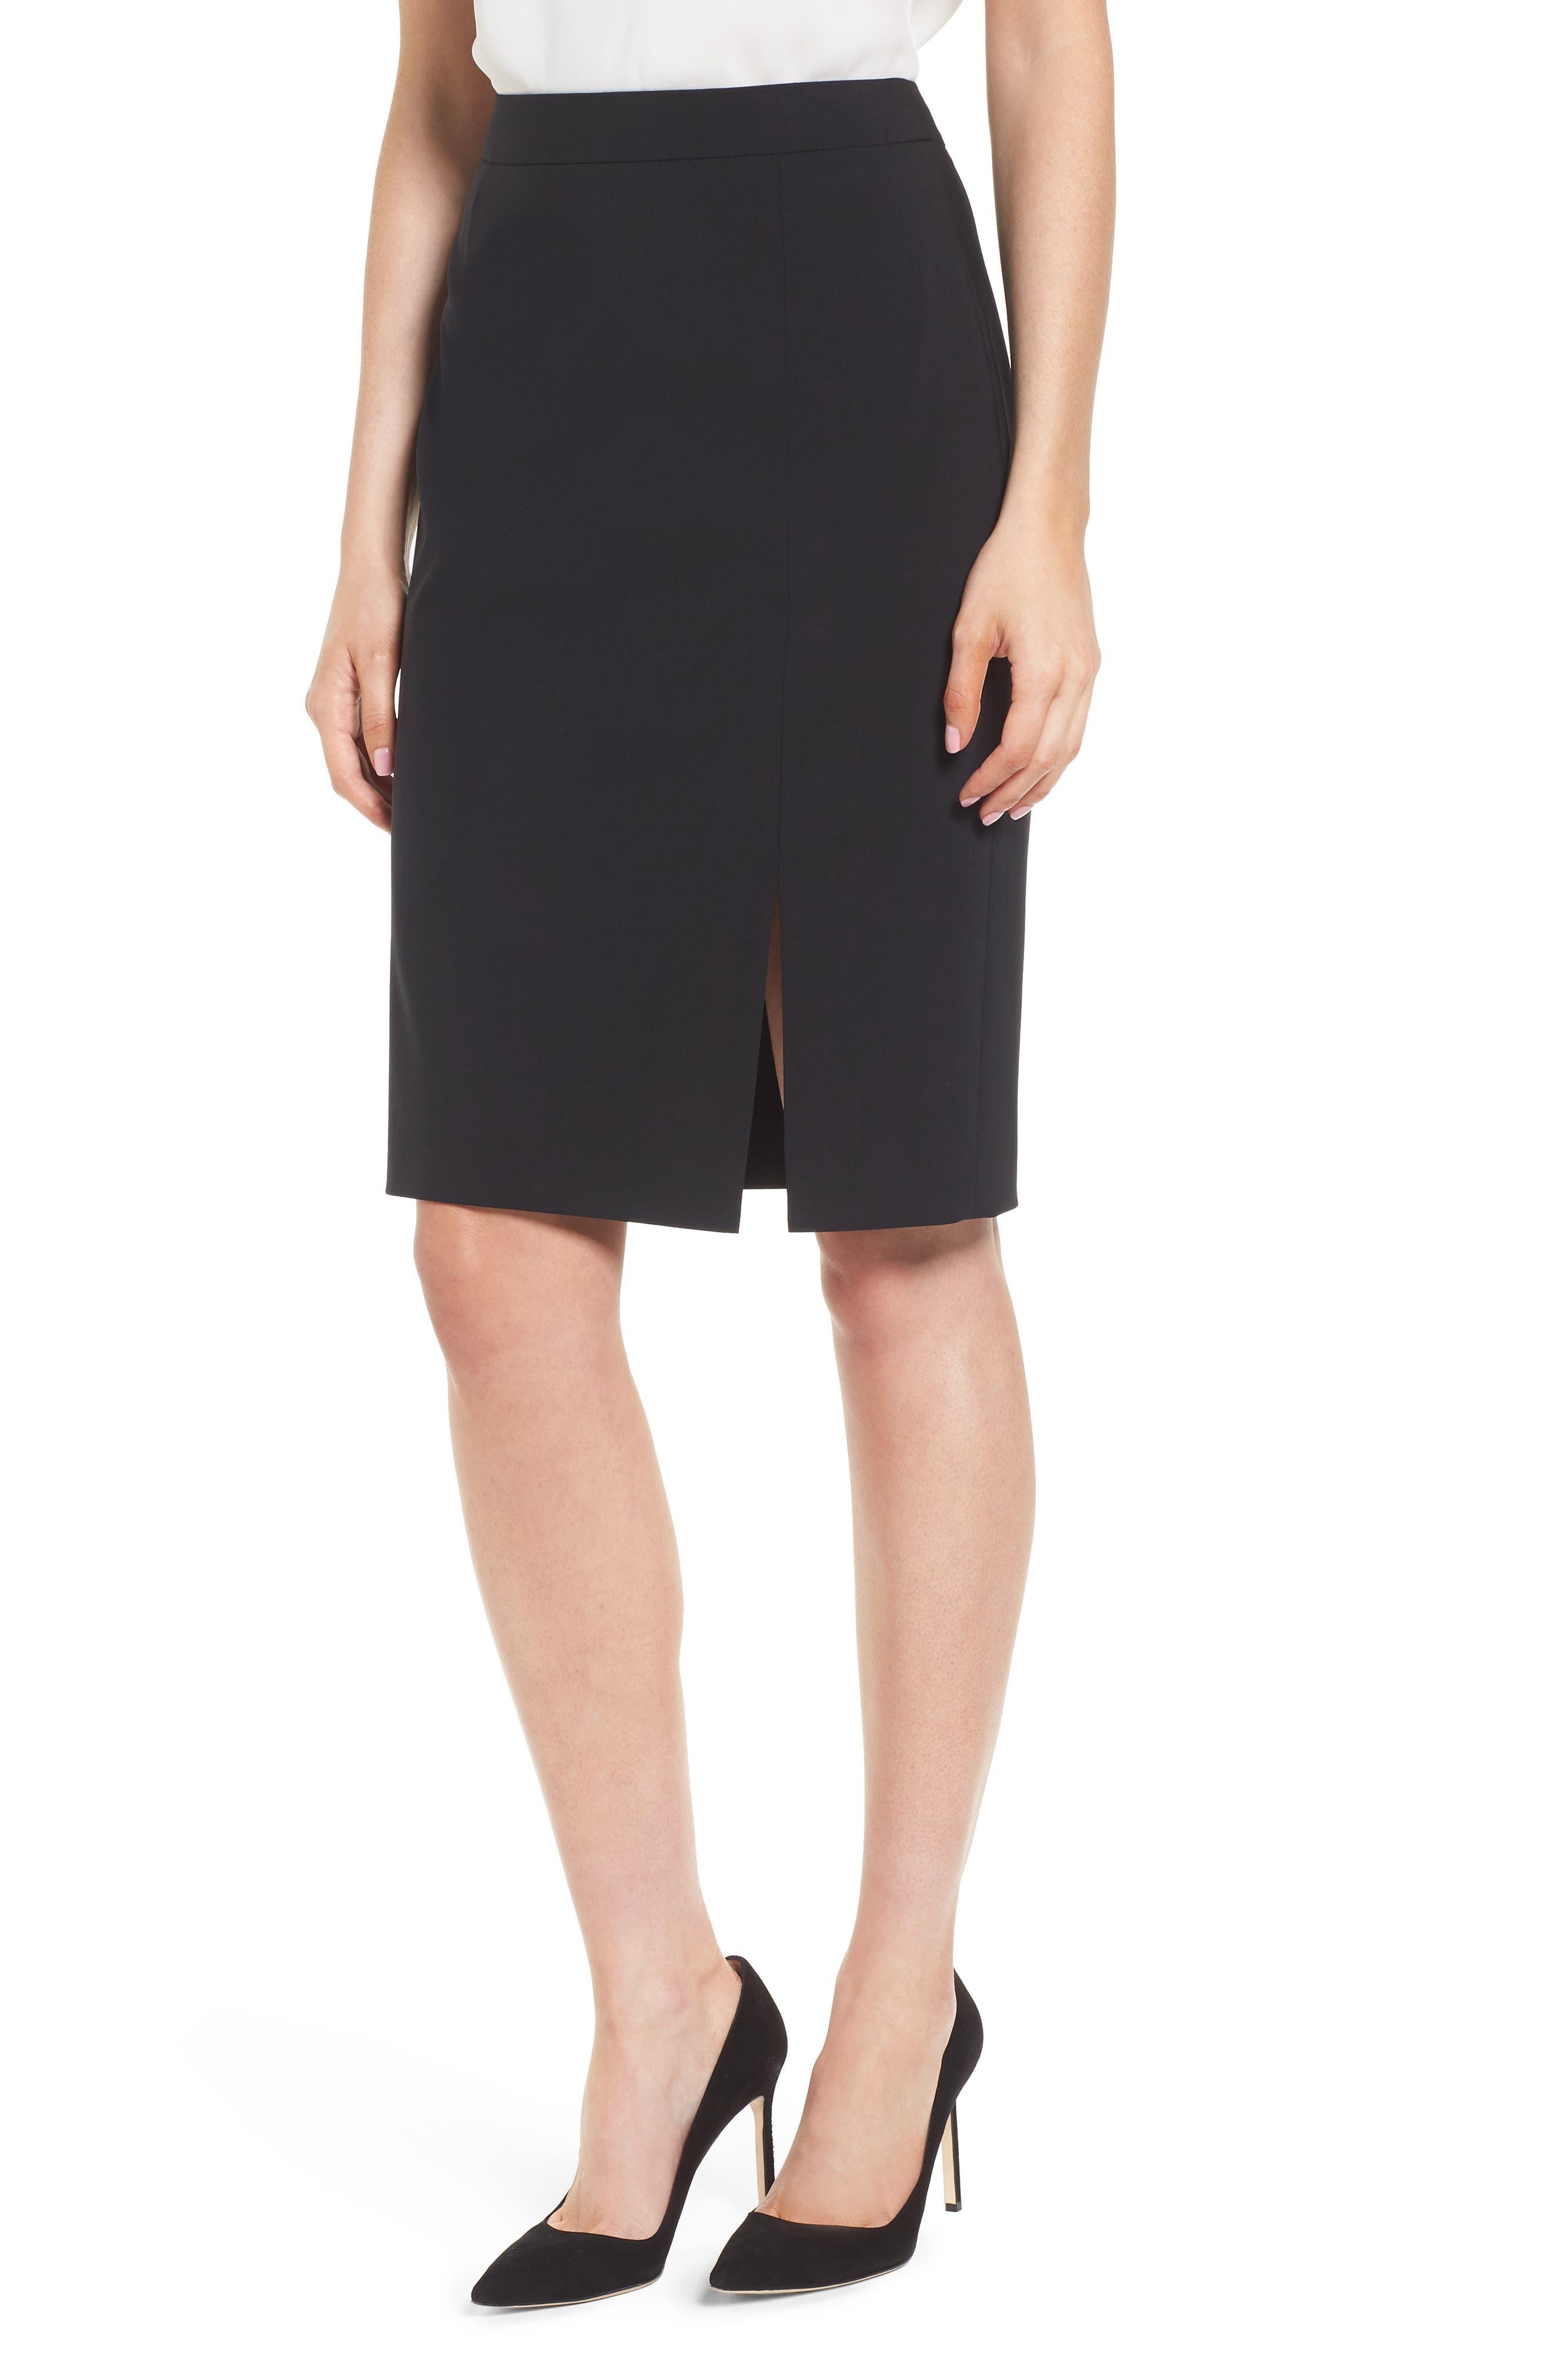 Volania Stretch Wool Pencil Skirt,                             Main thumbnail 1, color,                             BLACK